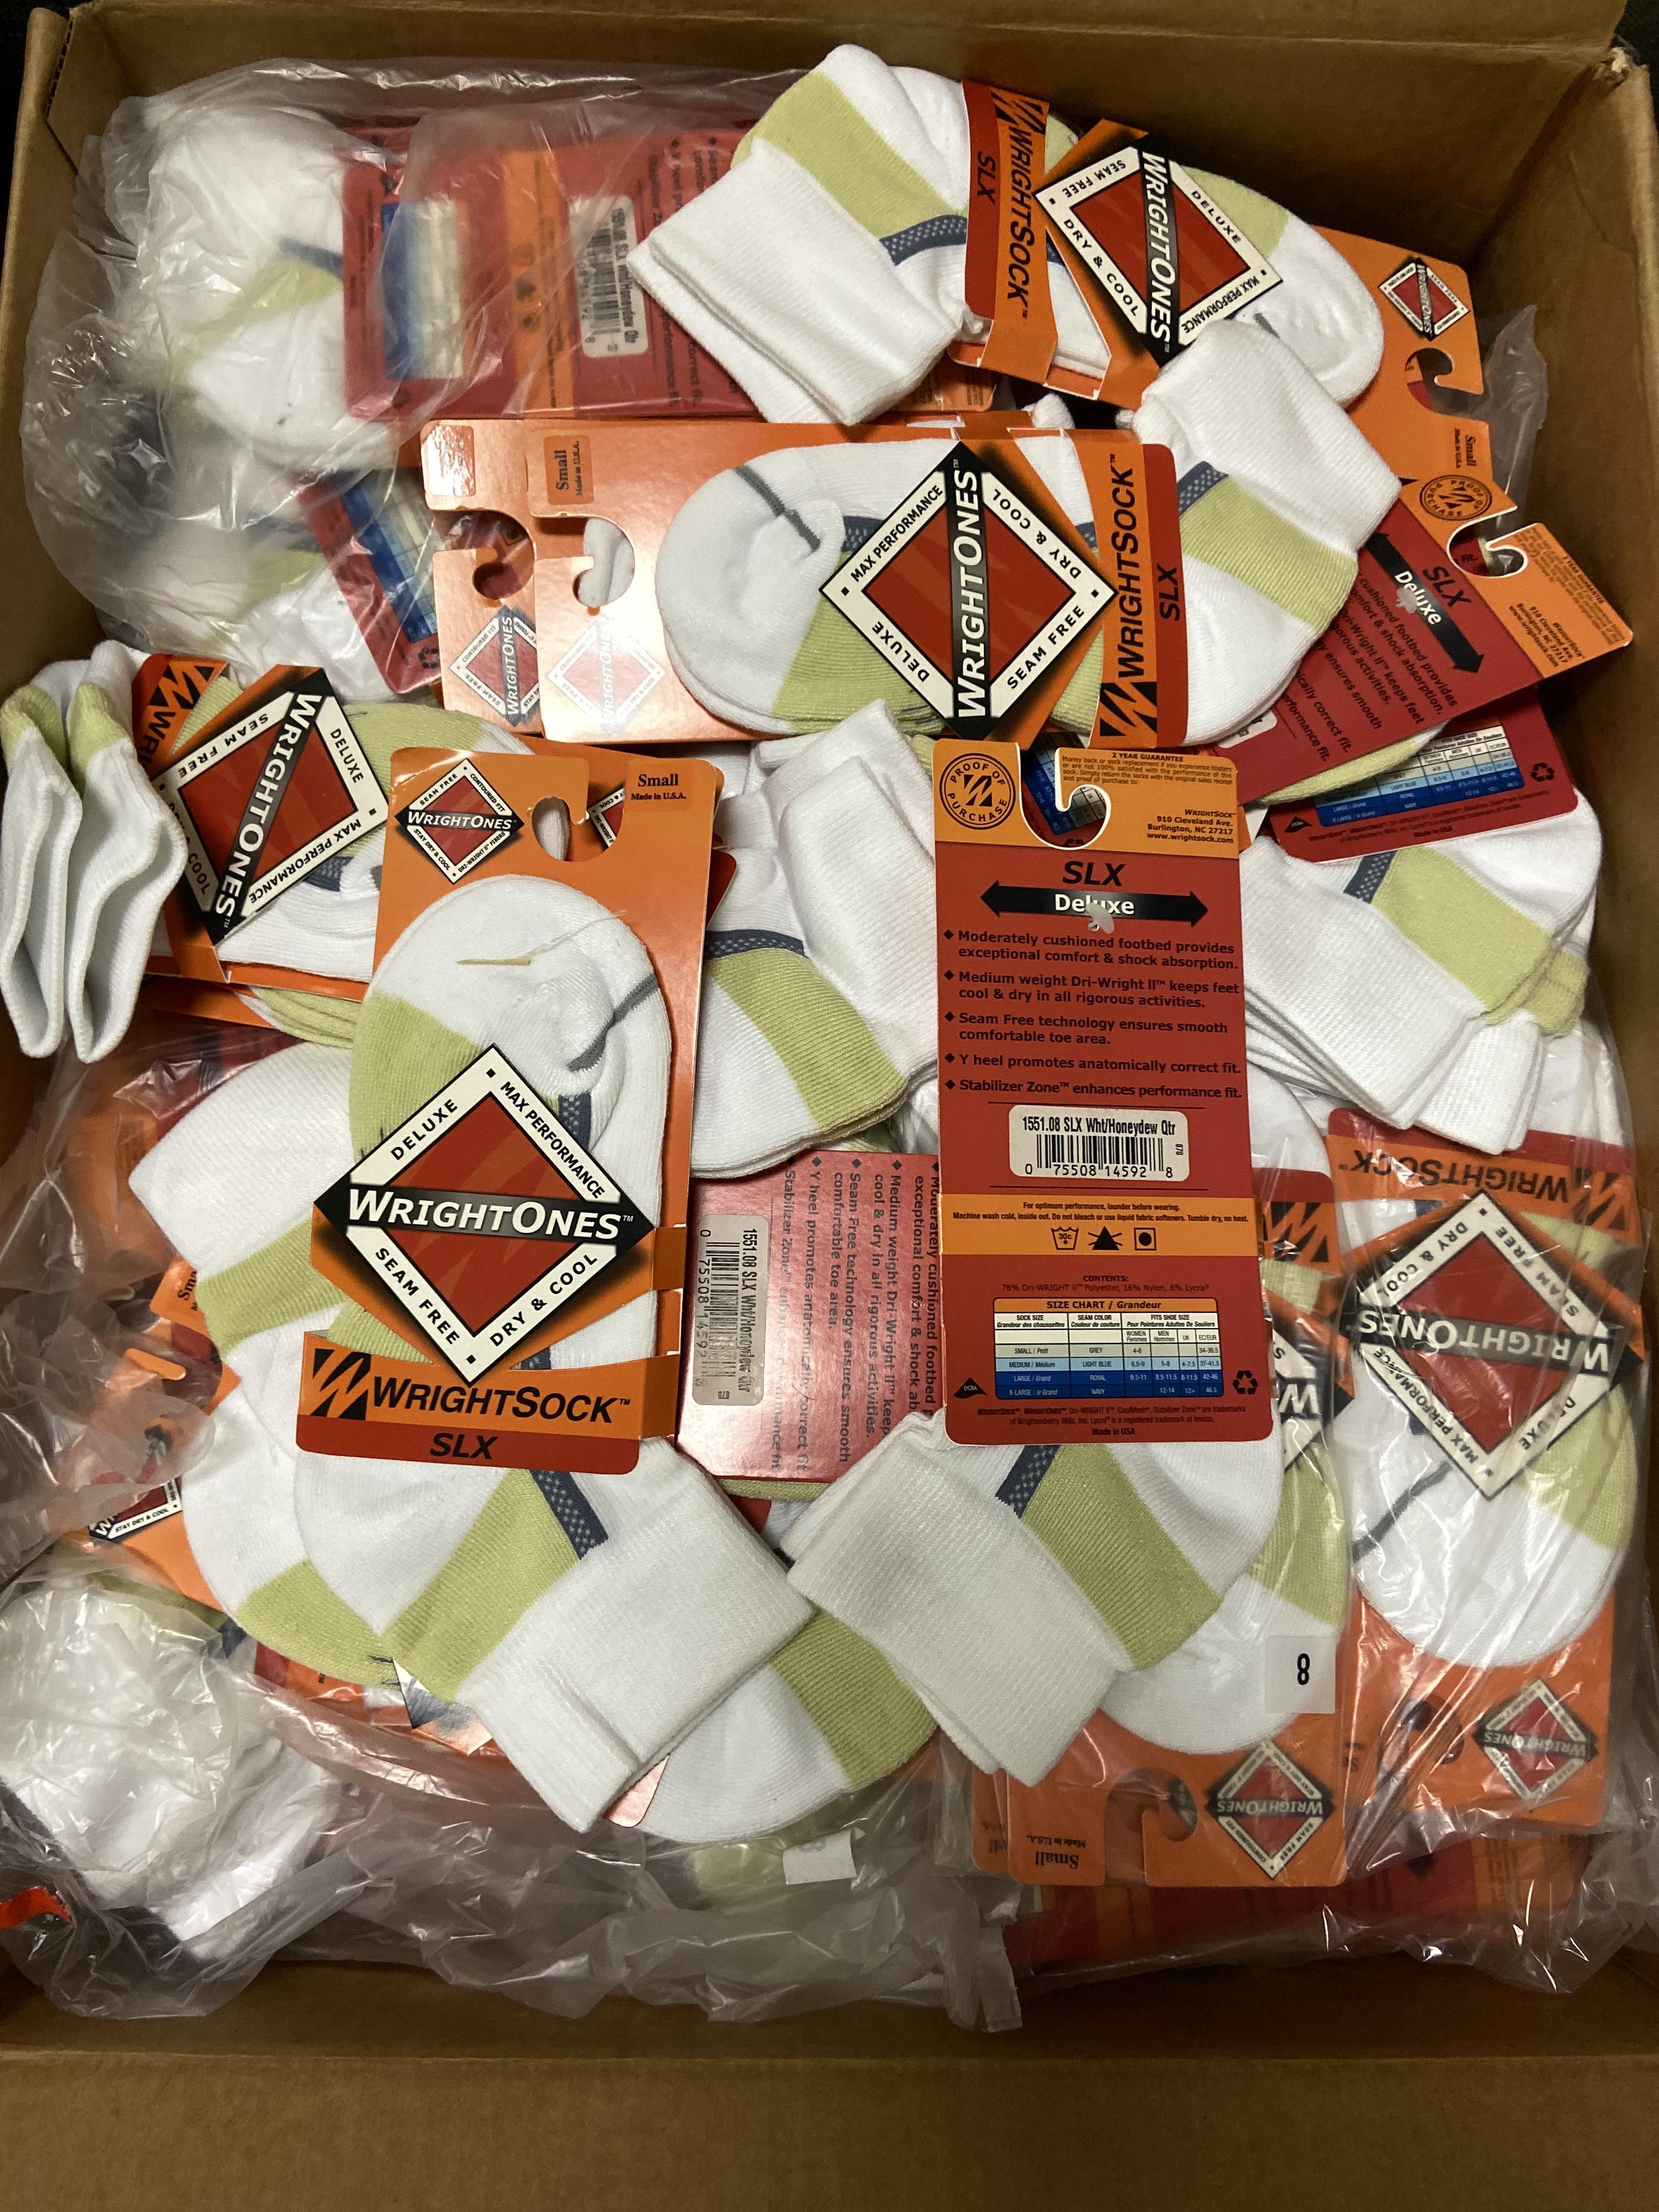 500+ packs of New Socks, Wrightsocks Coolmesh and WrightOnes SLX, Various White Styles - Image 3 of 6